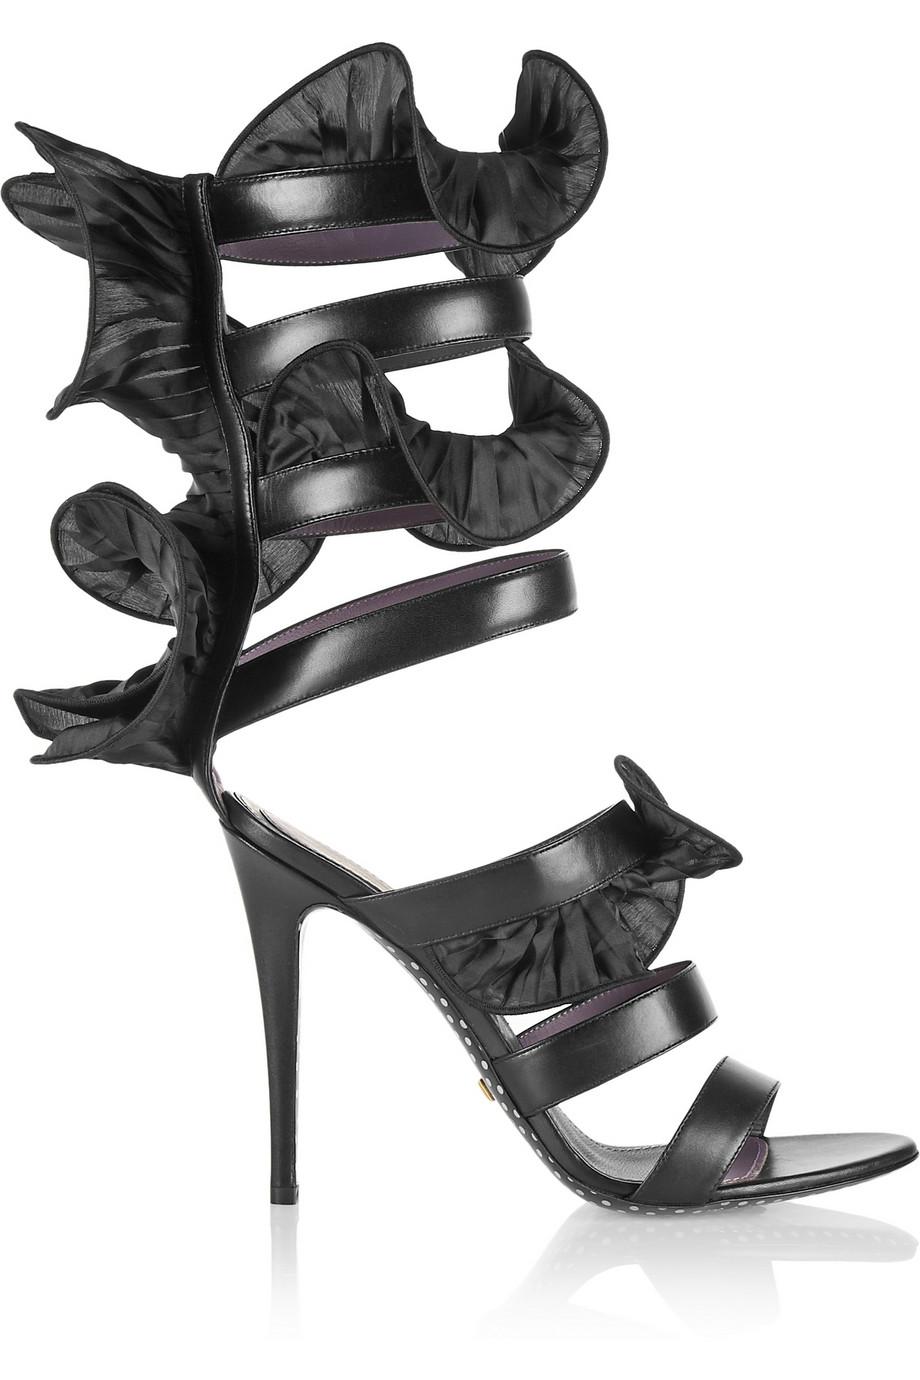 Emanuel Ungaro shoes